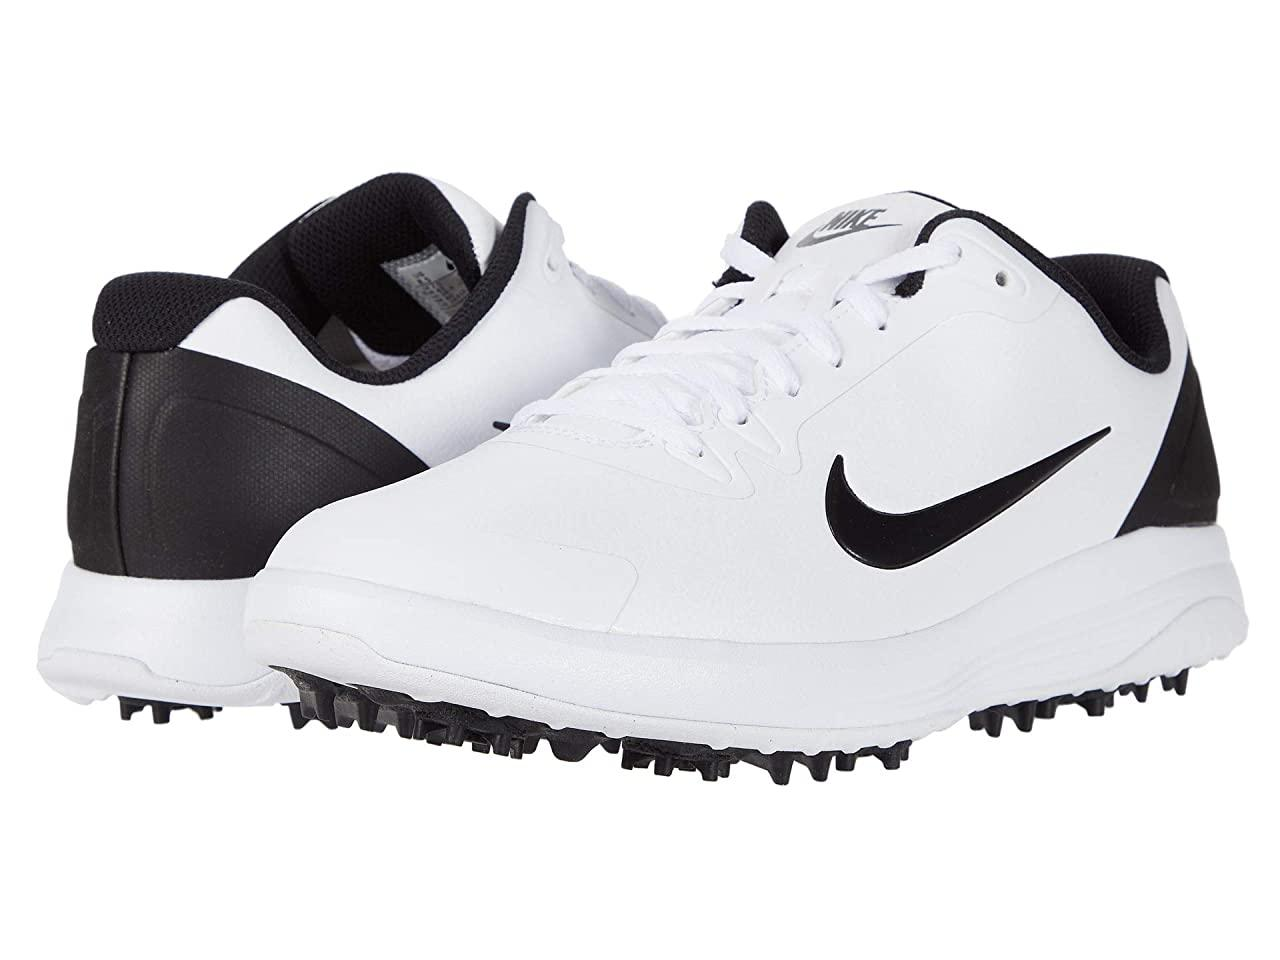 Кроссовки/Кеды (Оригинал) Nike Golf Nike Infinity G White/Black